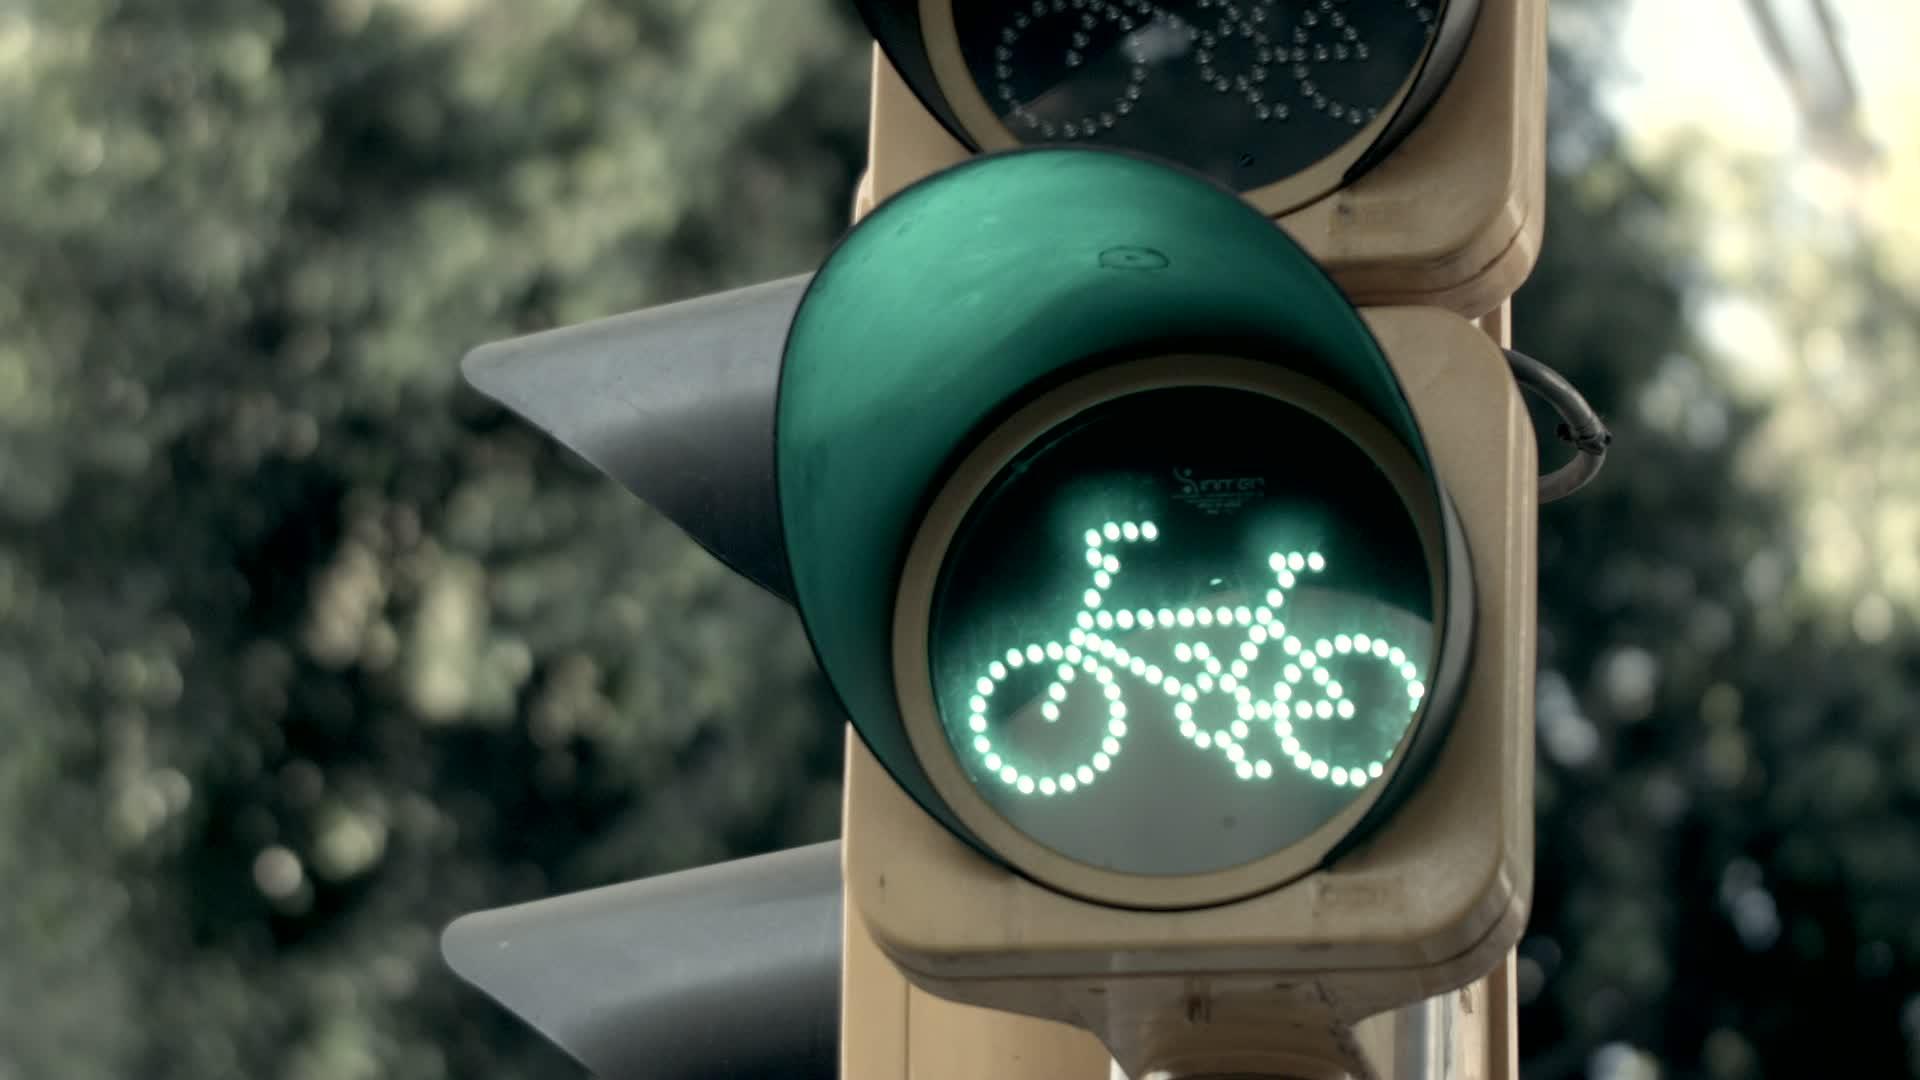 AUFA 2014 Kick off - Team Mexico-City mit Betriebssystem für urbane Mobilität